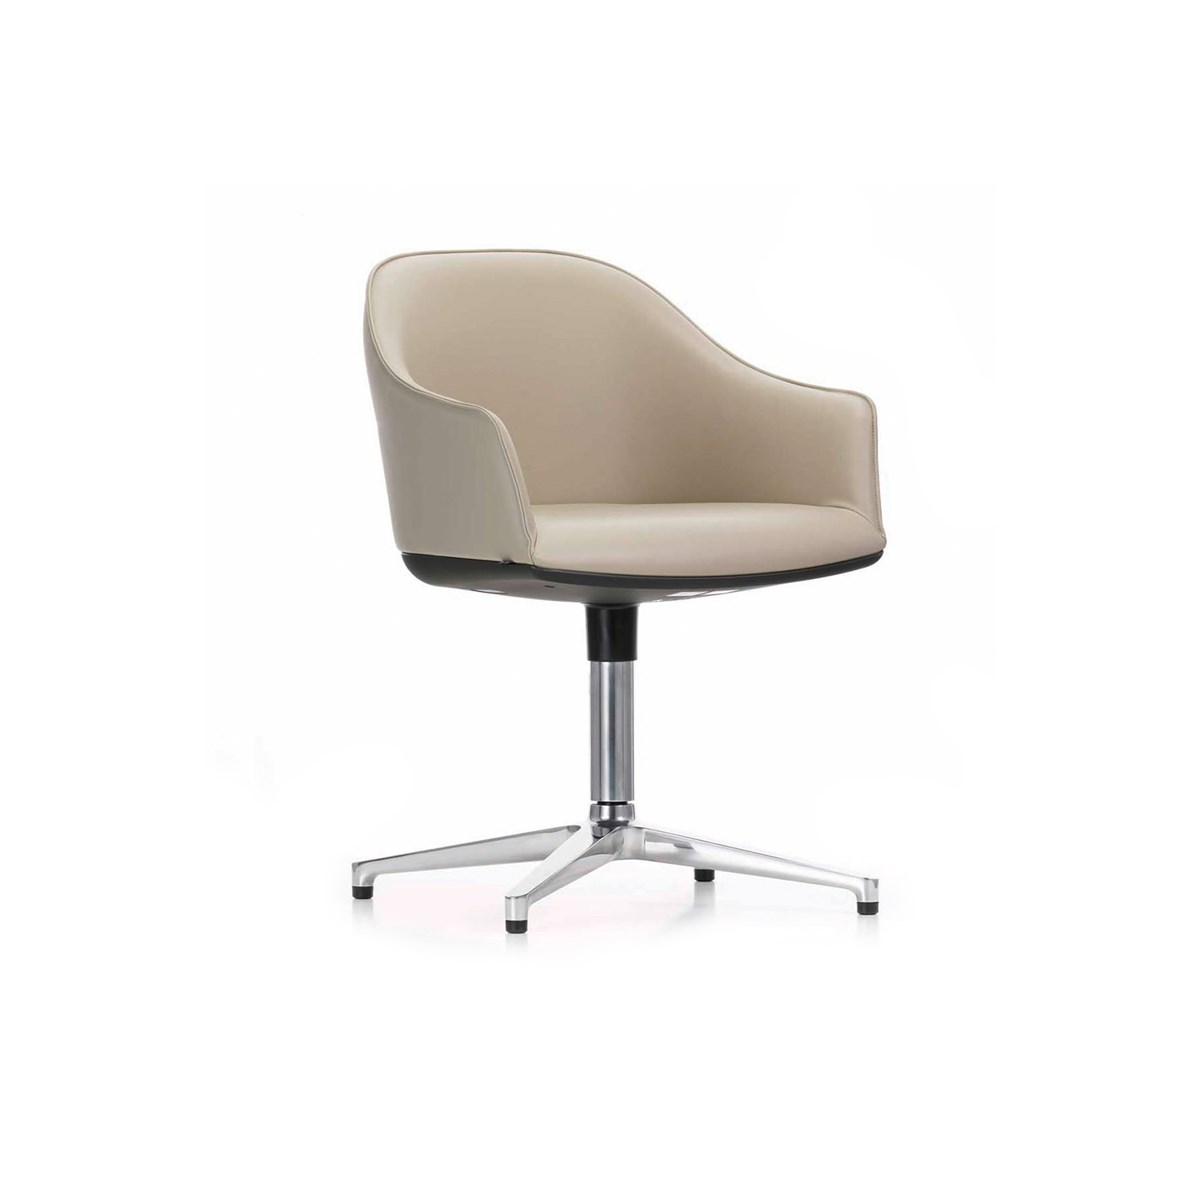 Vitra-Ronan-Erwan-Bouroullec-Softchair-Office-Chairs-Matisse-1